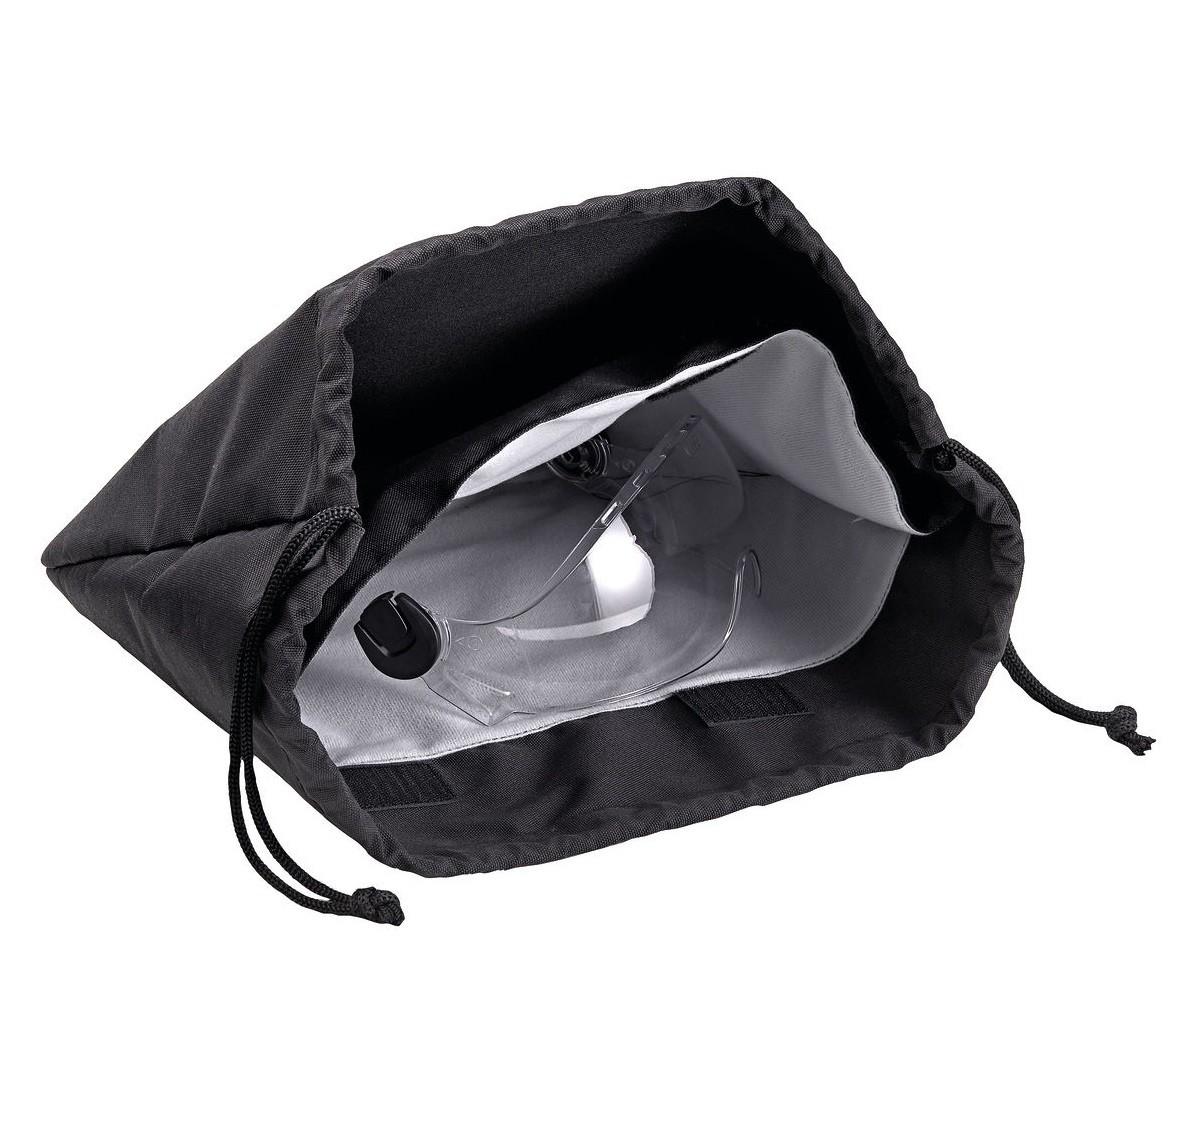 Capa Protetora para Armazenar Capacetes Vertex e Strato Petzl